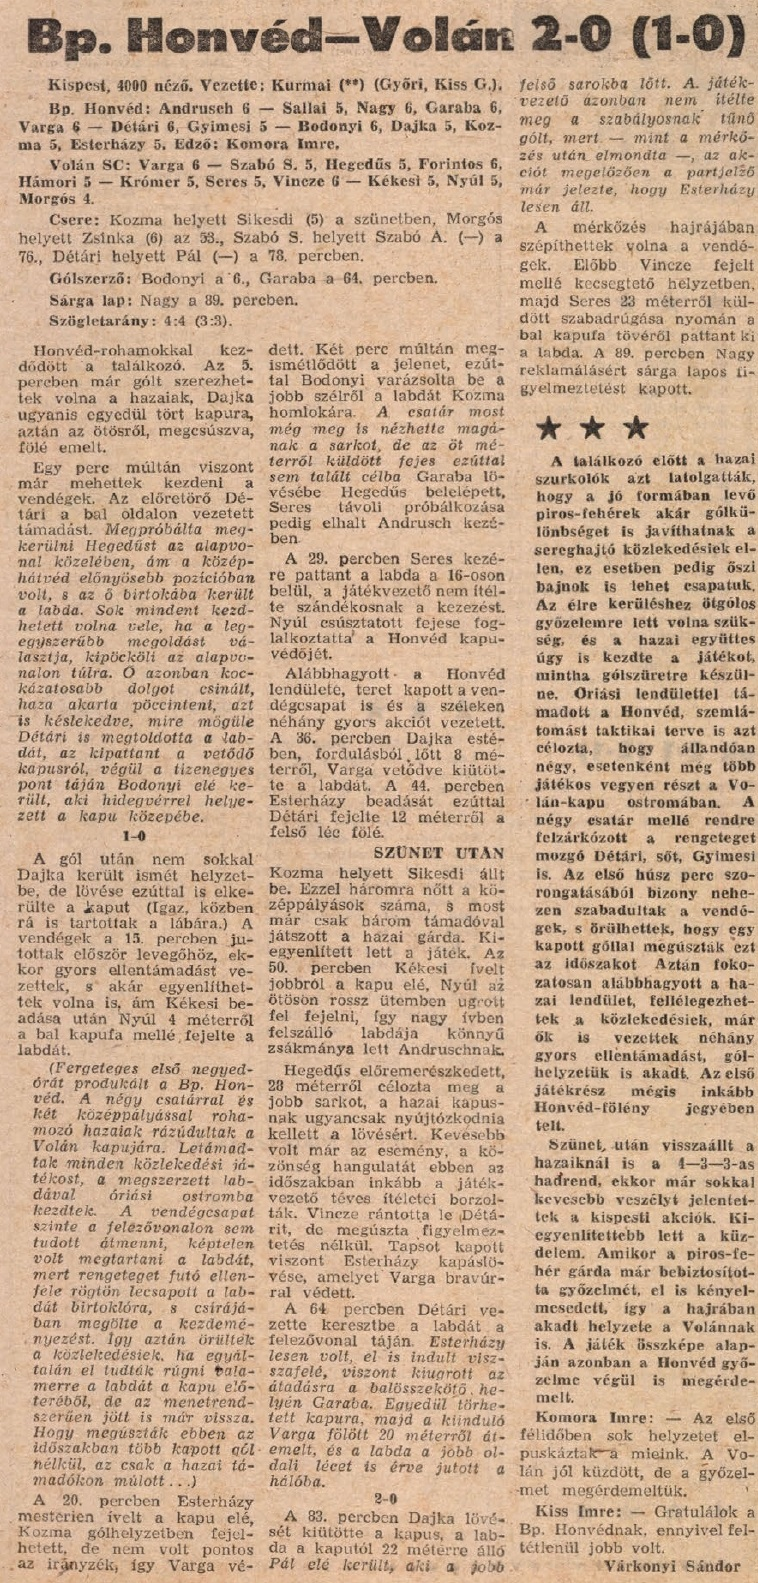 idokapszula_nb_i_1983_84_15_fordulo_bp_honved_volan.jpg